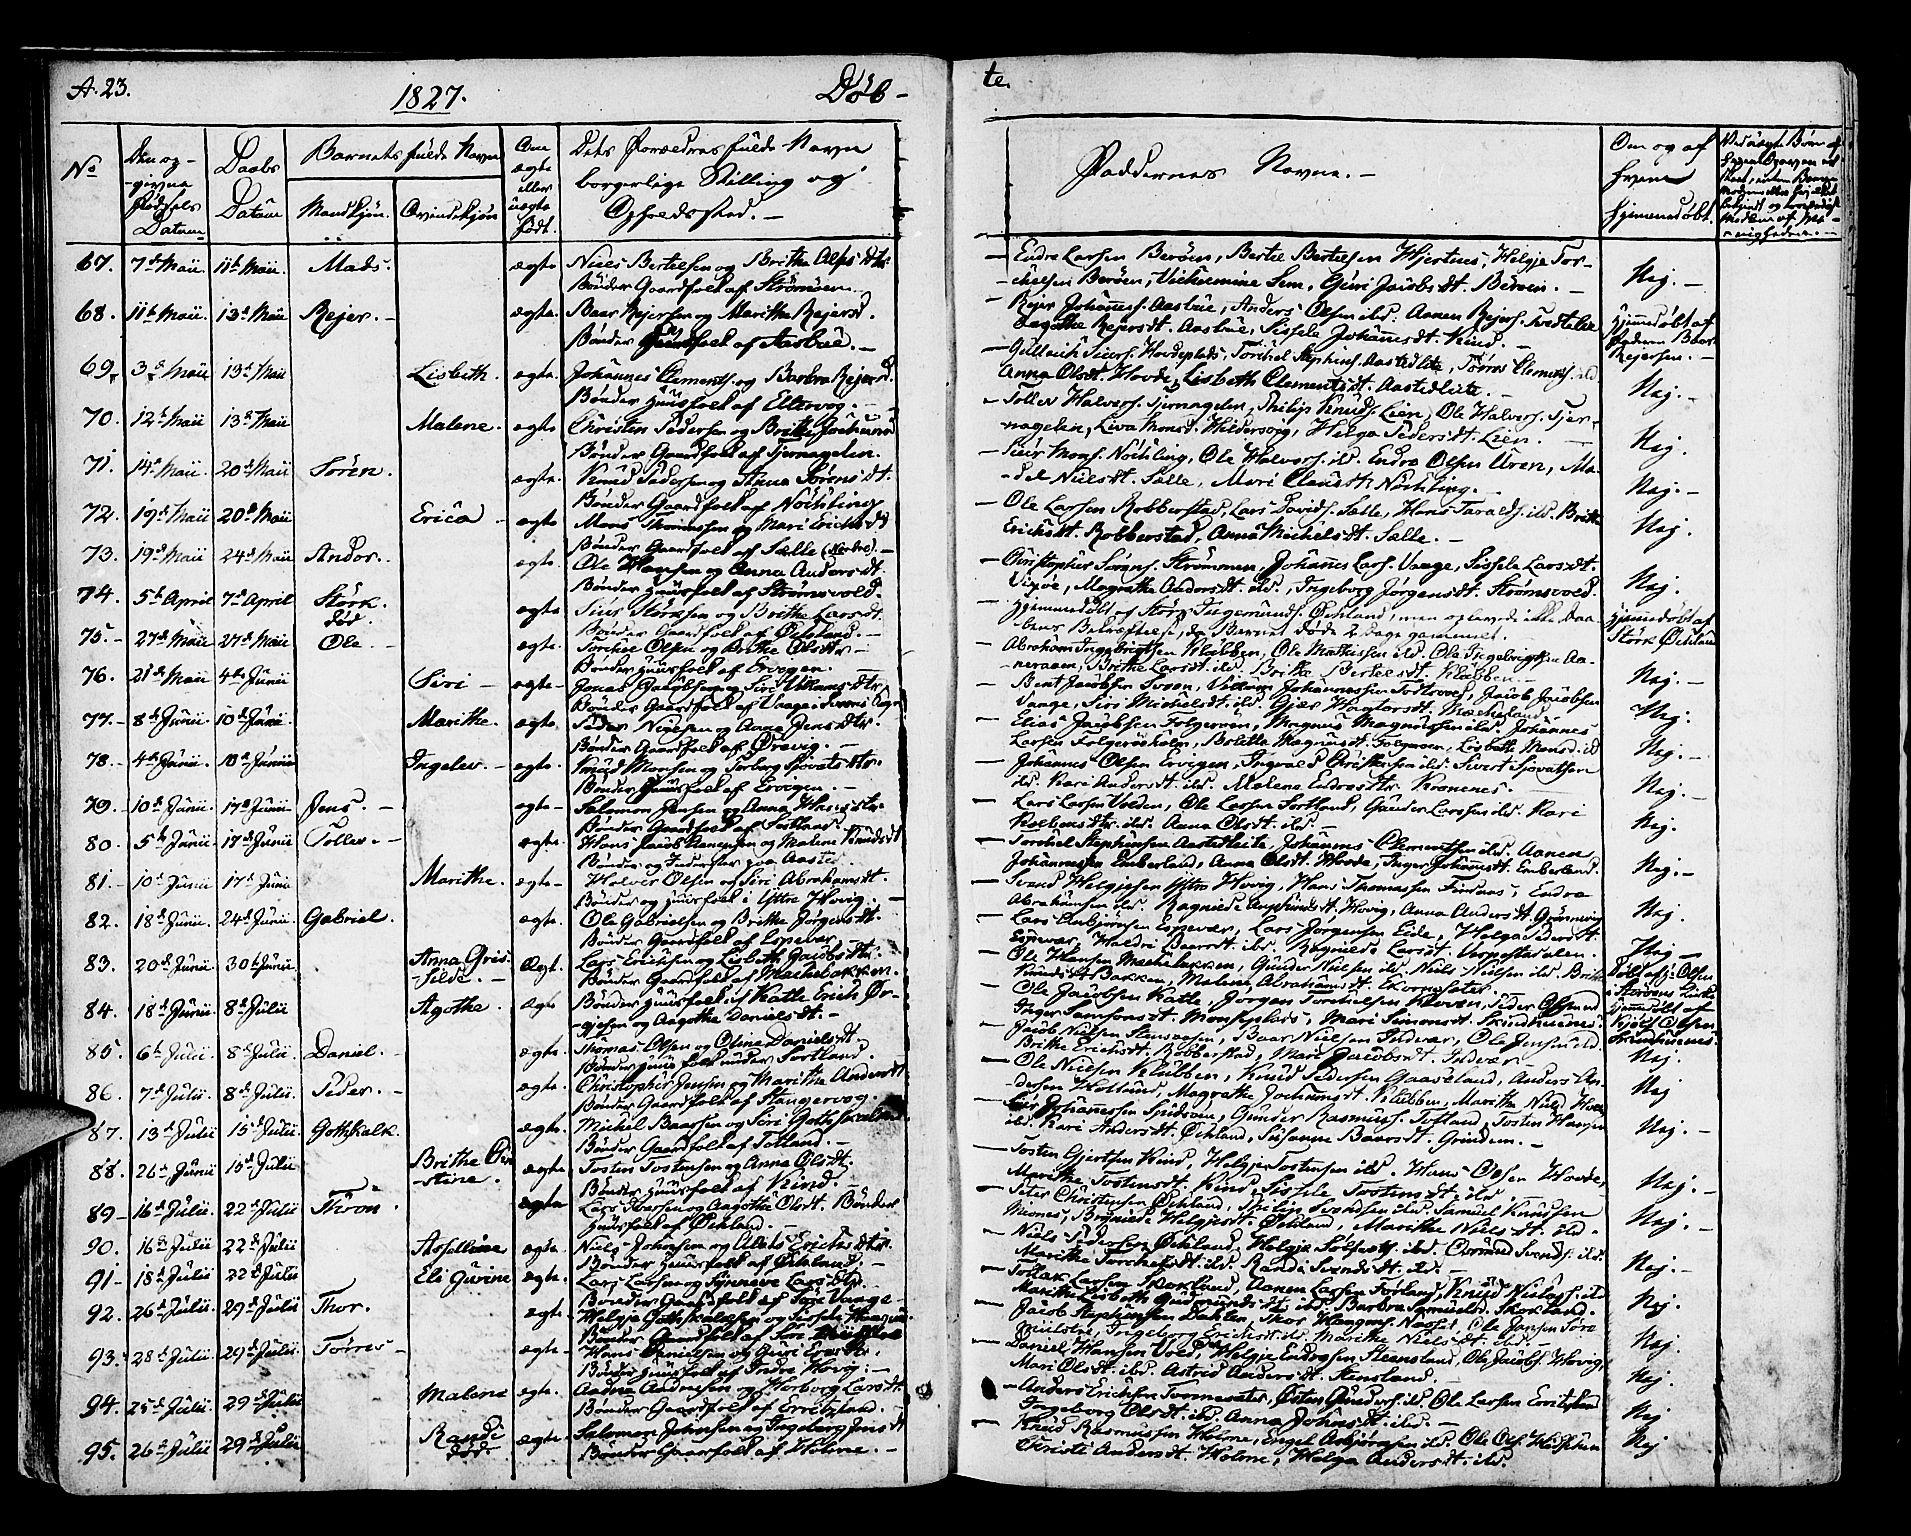 SAB, Finnås sokneprestembete, H/Ha/Haa/Haaa/L0005: Ministerialbok nr. A 5, 1823-1835, s. 23